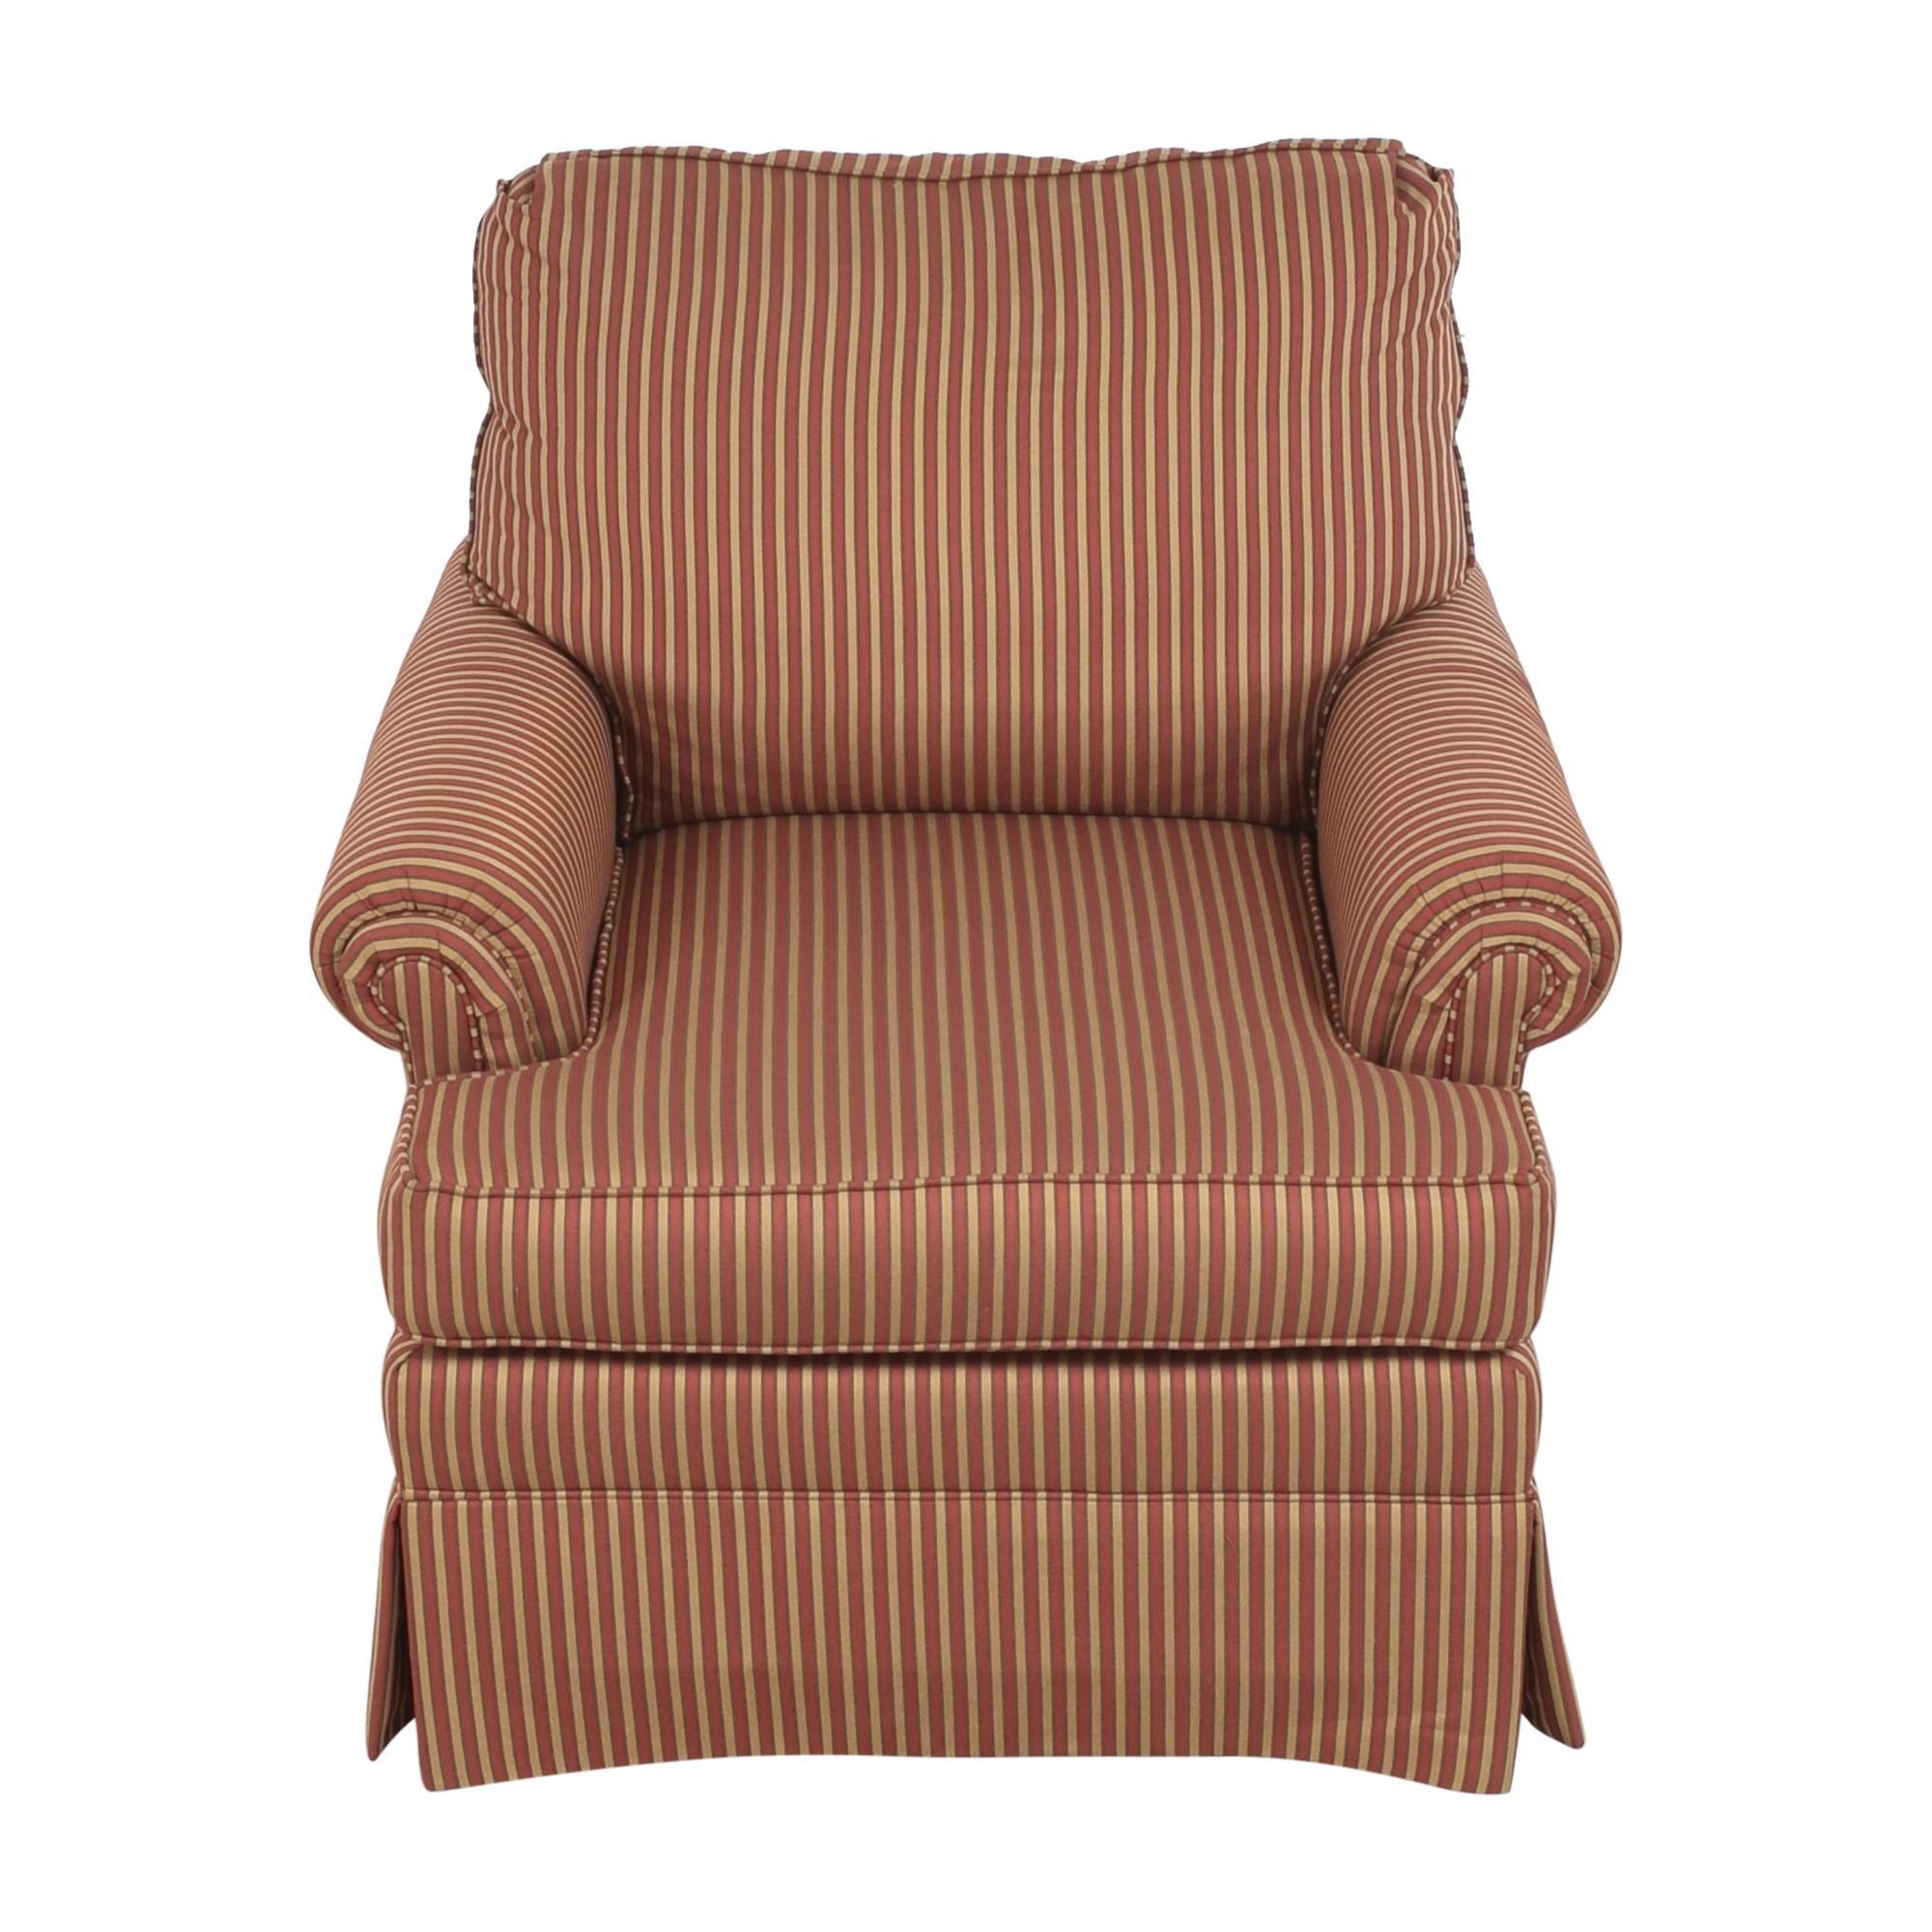 Ethan Allen Ethan Allen Mr. Chair for sale